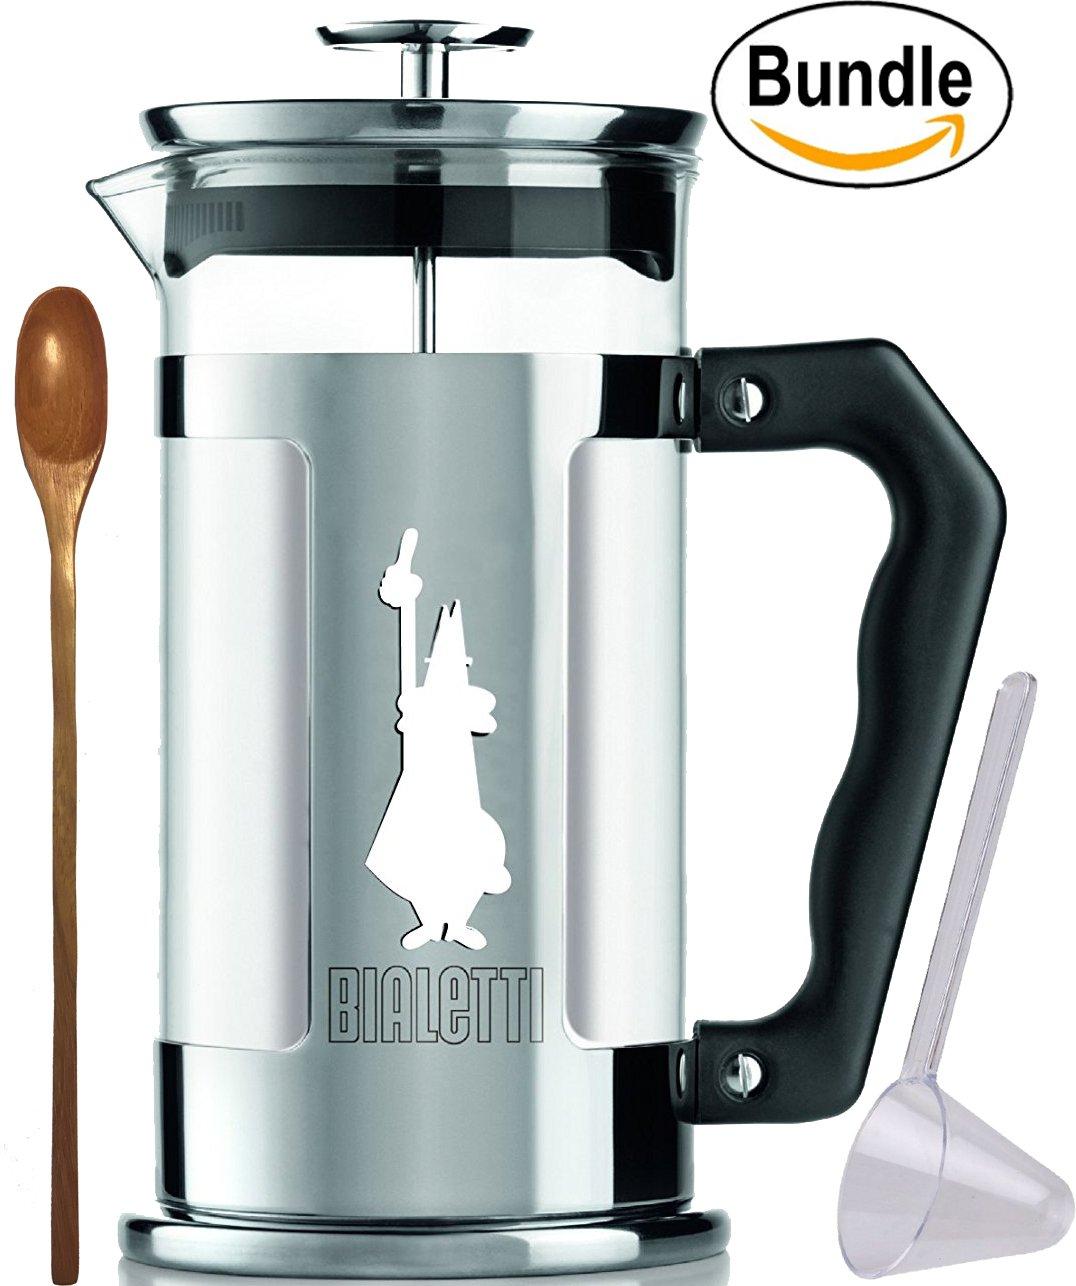 Bialetti 06852 Preziosa 8 Cup / 33oz French Press Coffee Maker, Stainless Steel, Silver & Zonoz Wooden Stirring Spoon (Bundle)